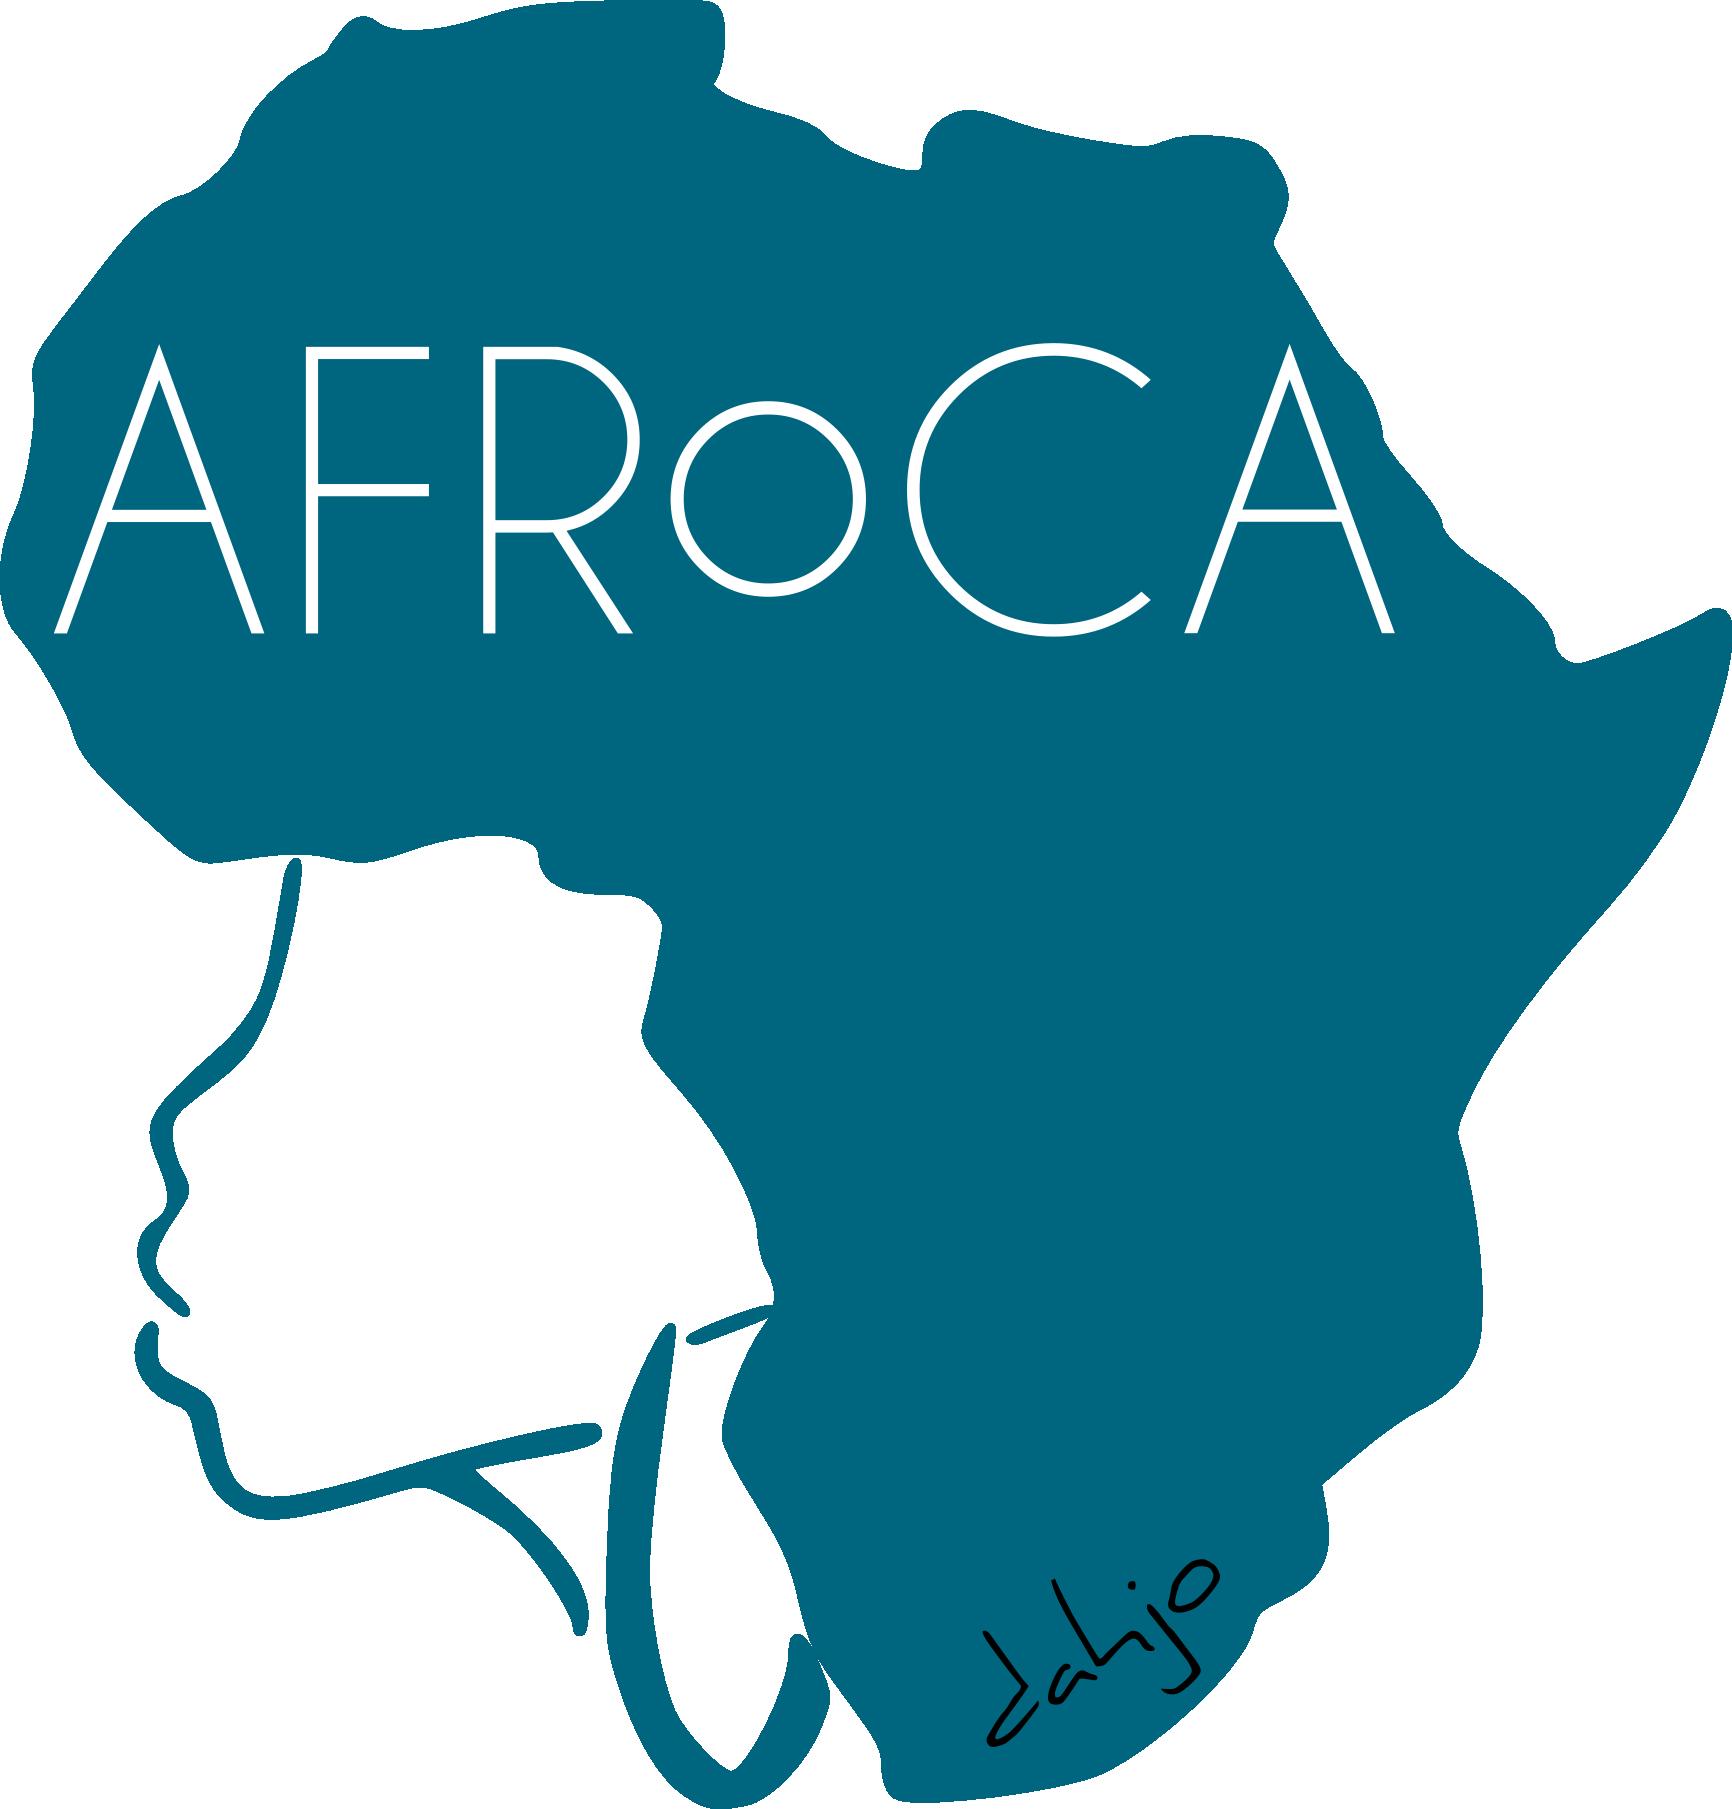 1732x1809 Dahjo Presents Afroca Female Afroca = Afro + Africa The Design